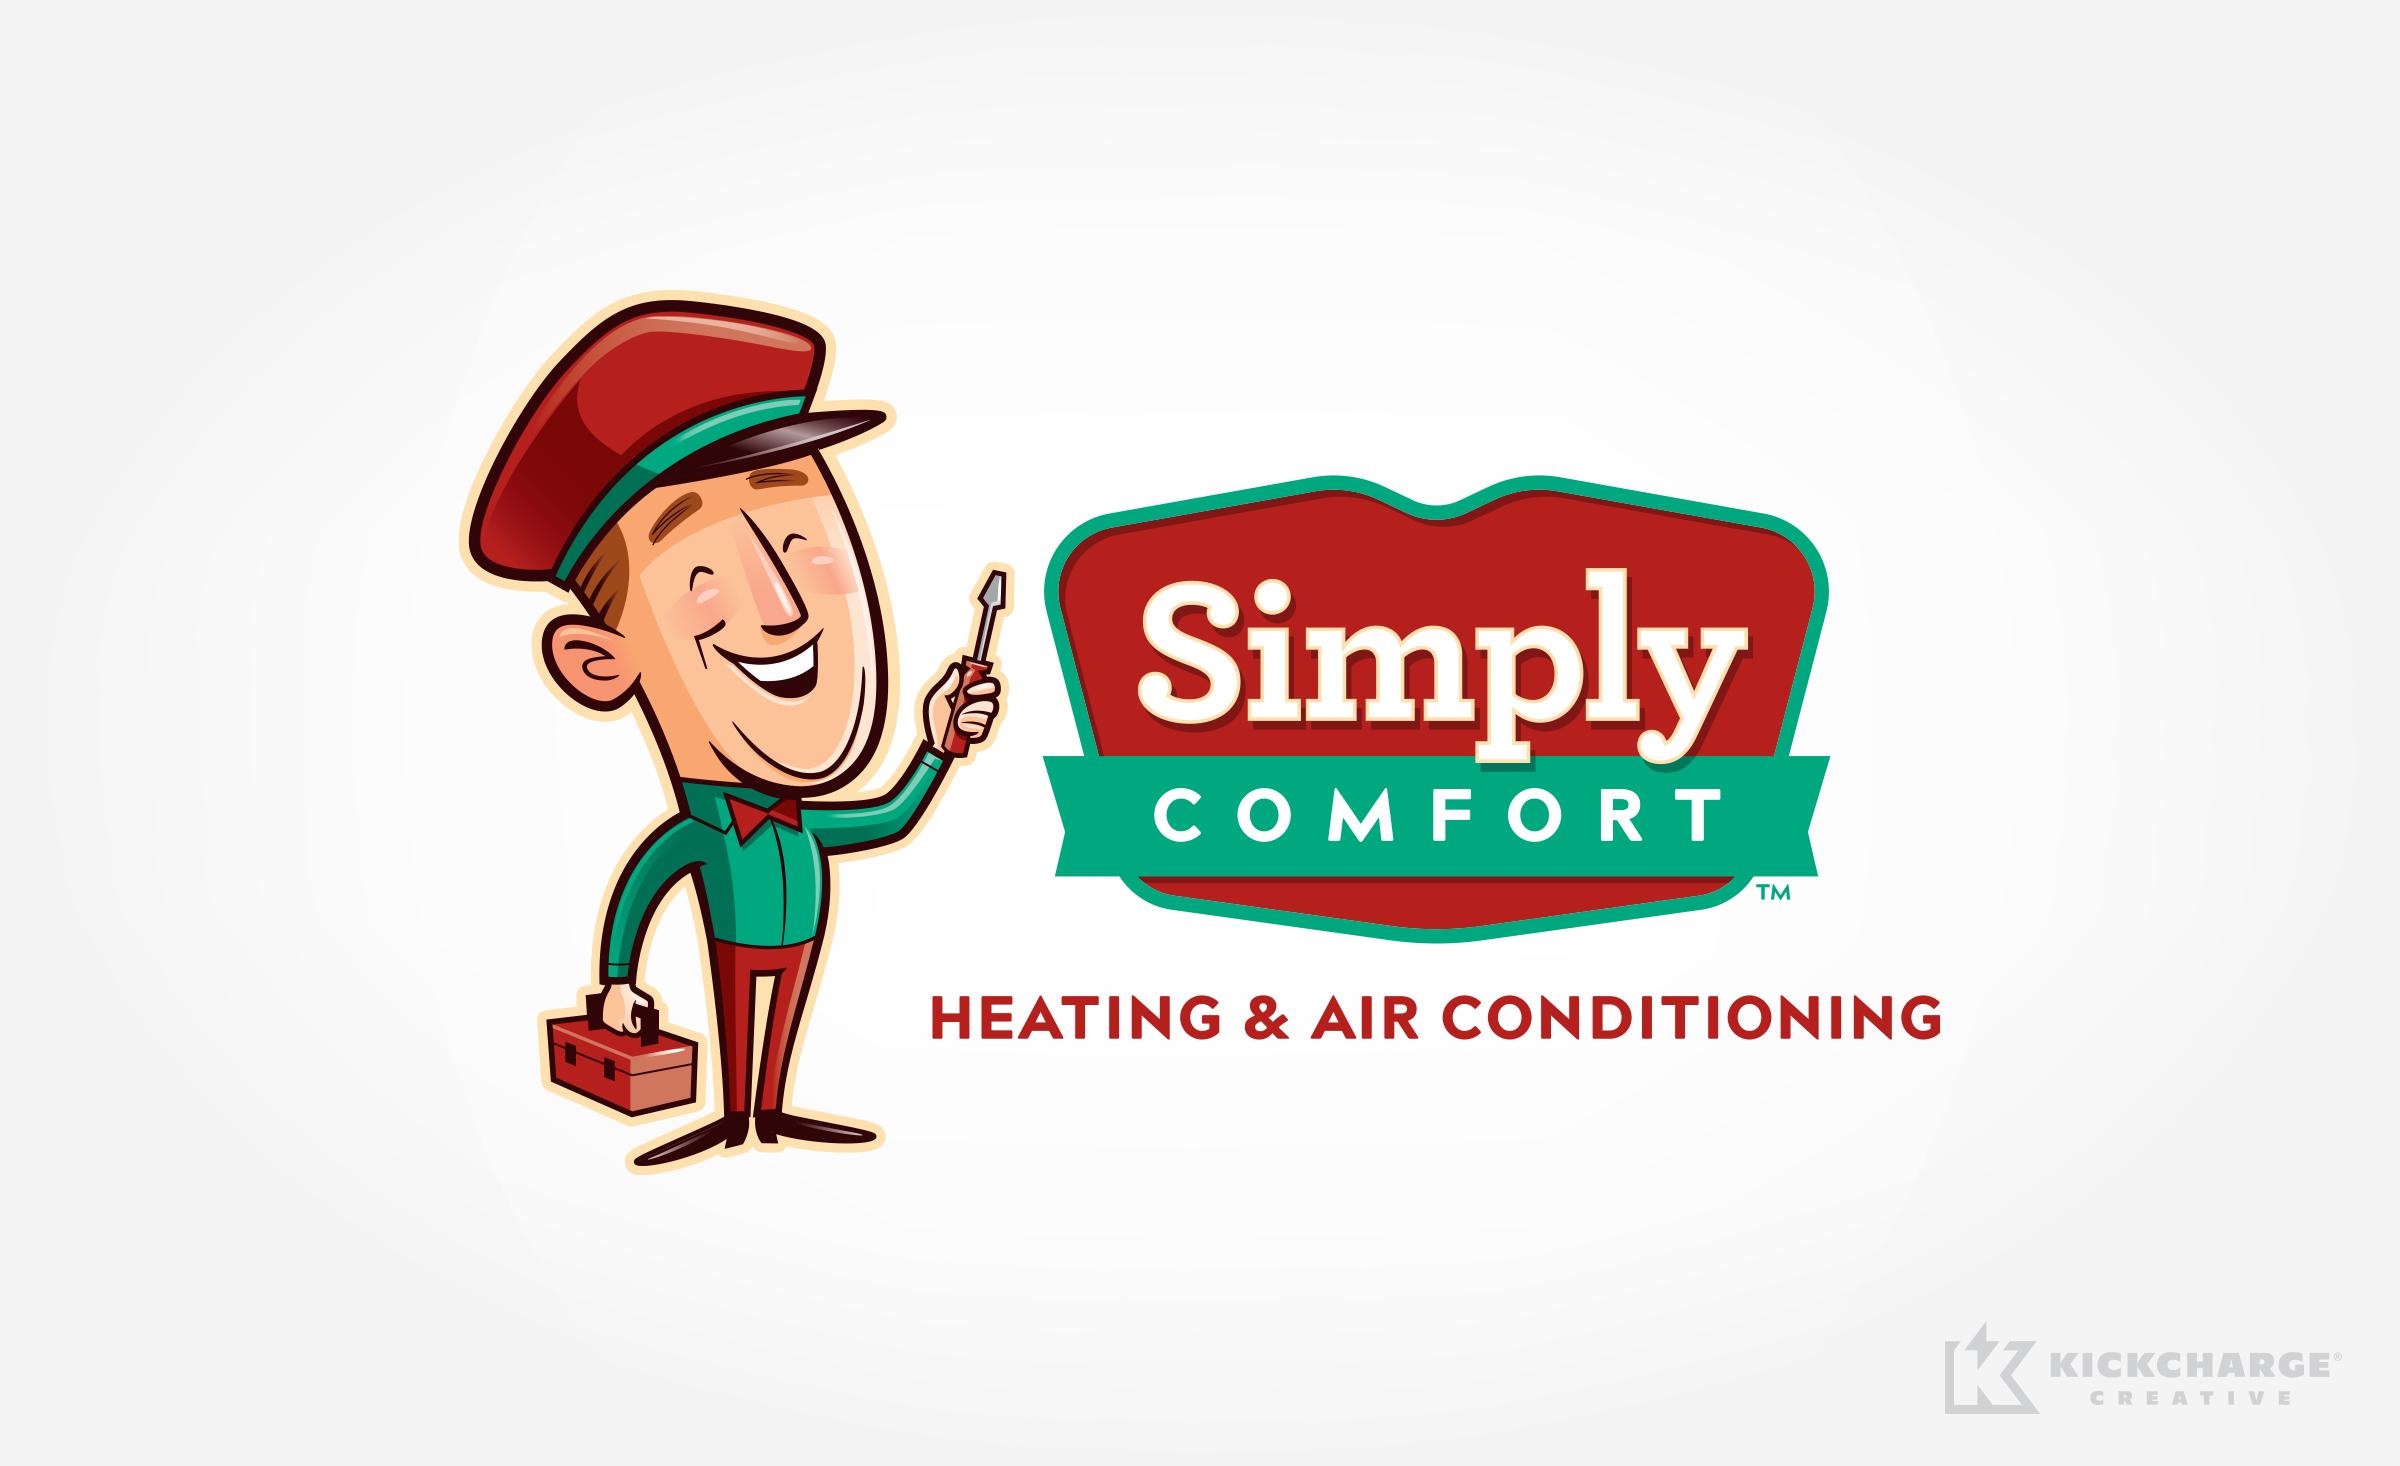 hvac logo for Simply Comfort